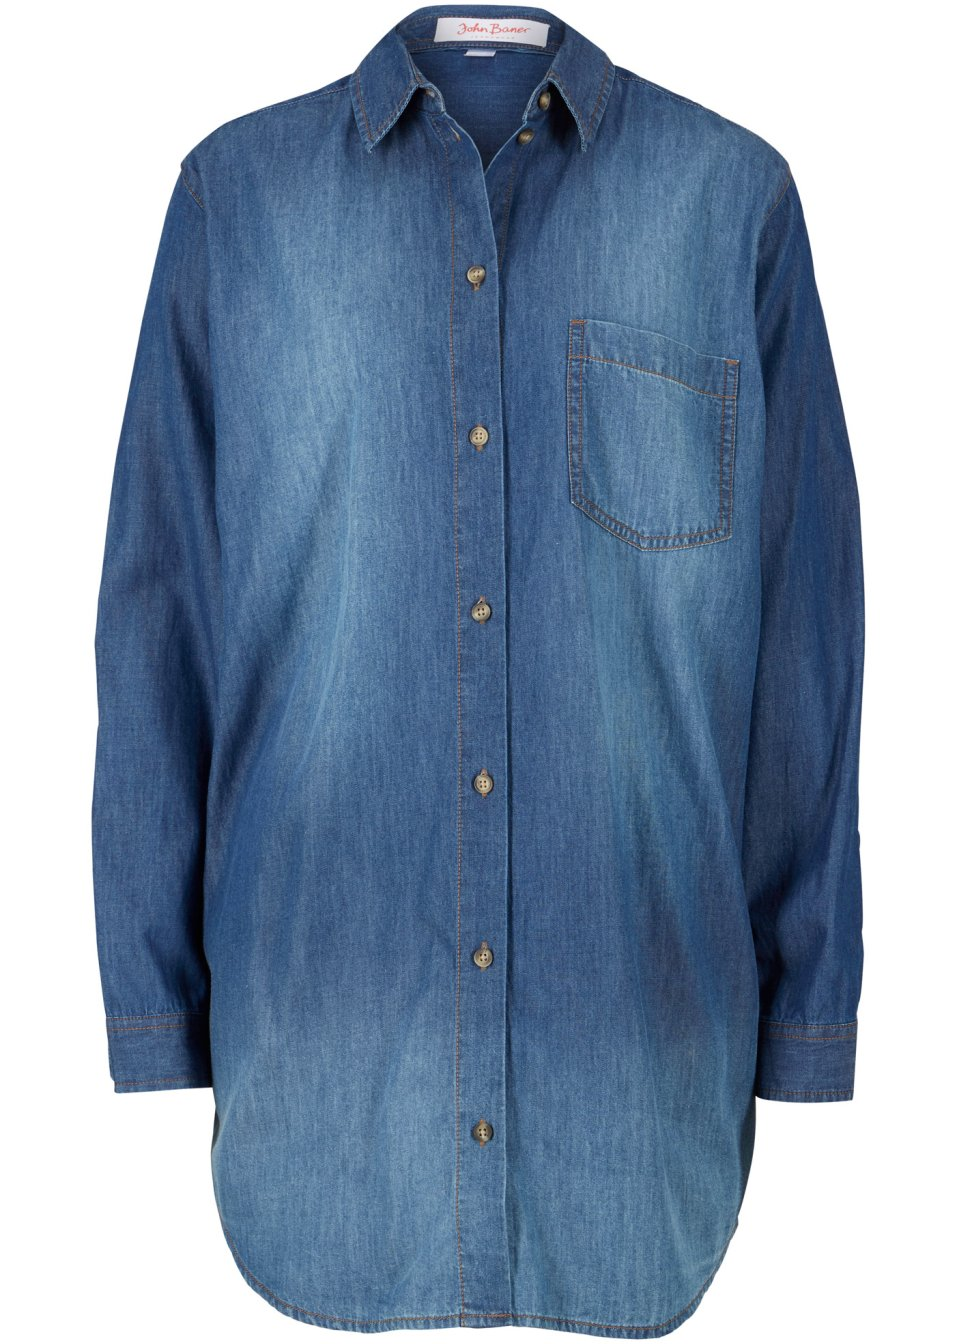 Jeansbluse extralang geschnitten blau - John Baner JEANSWEAR online kaufen - bonprix.de MH8hH nzXfQ